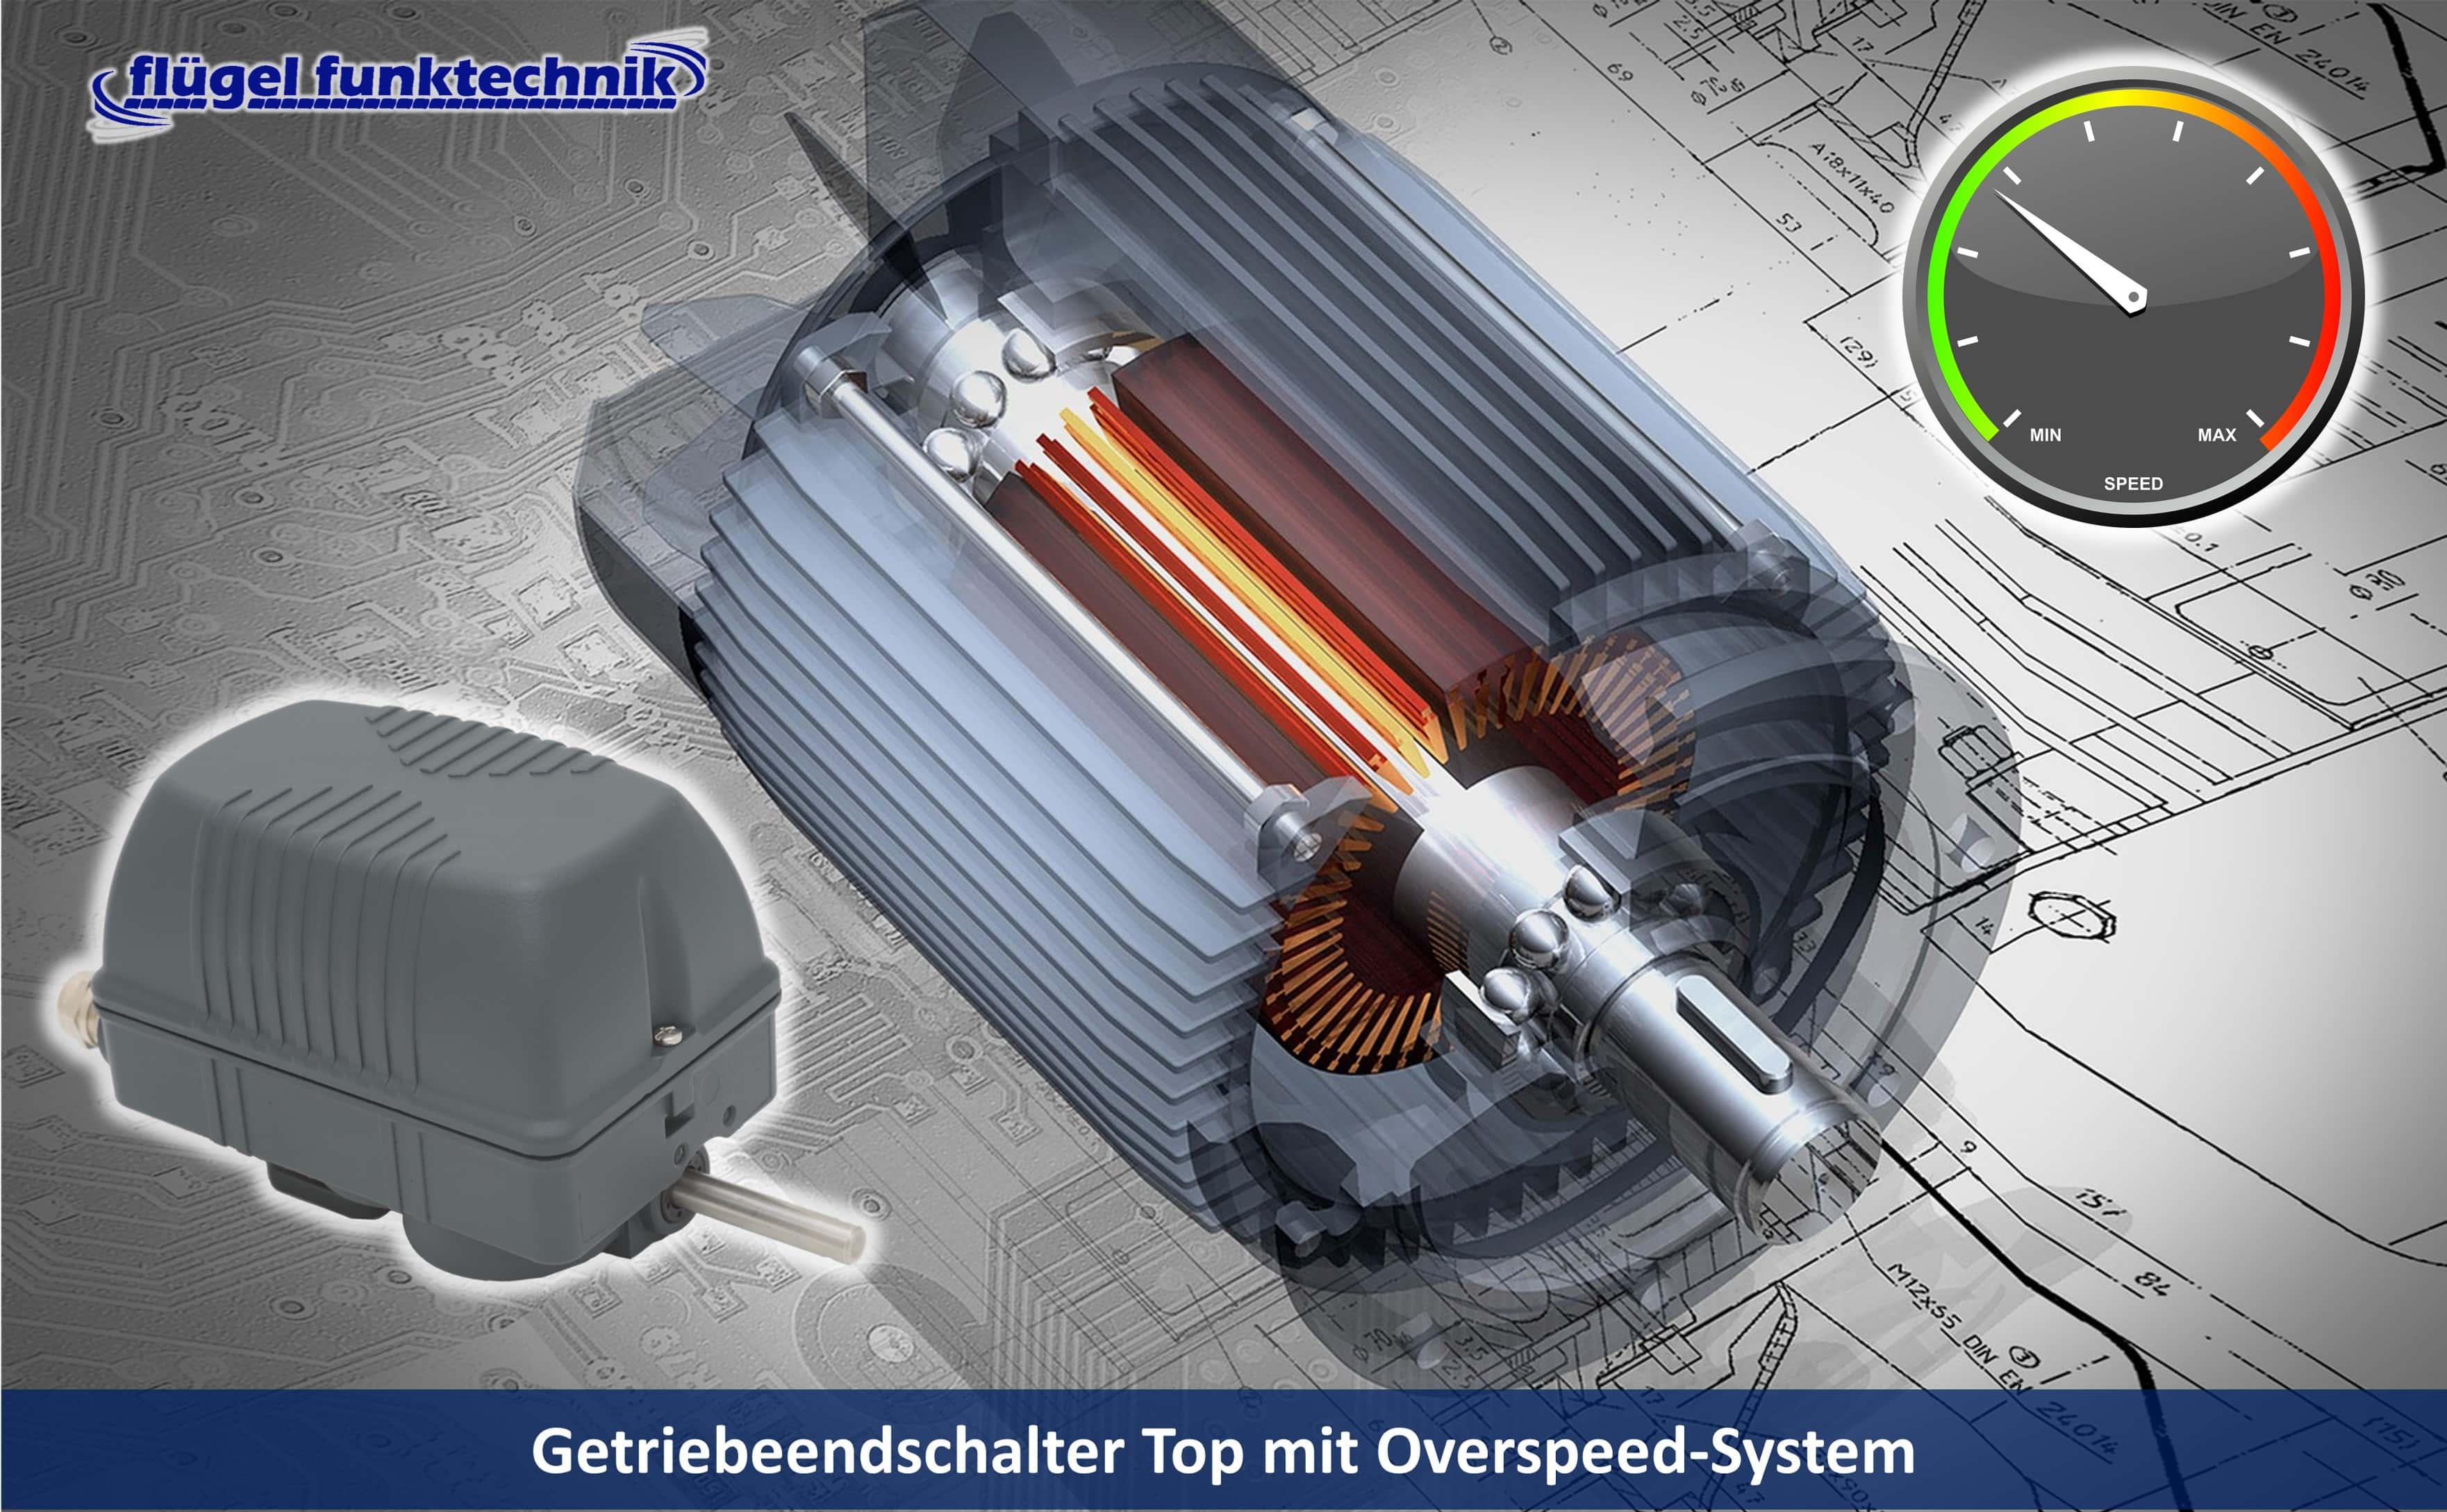 Getriebeendschalter Top mit Overspeed-System